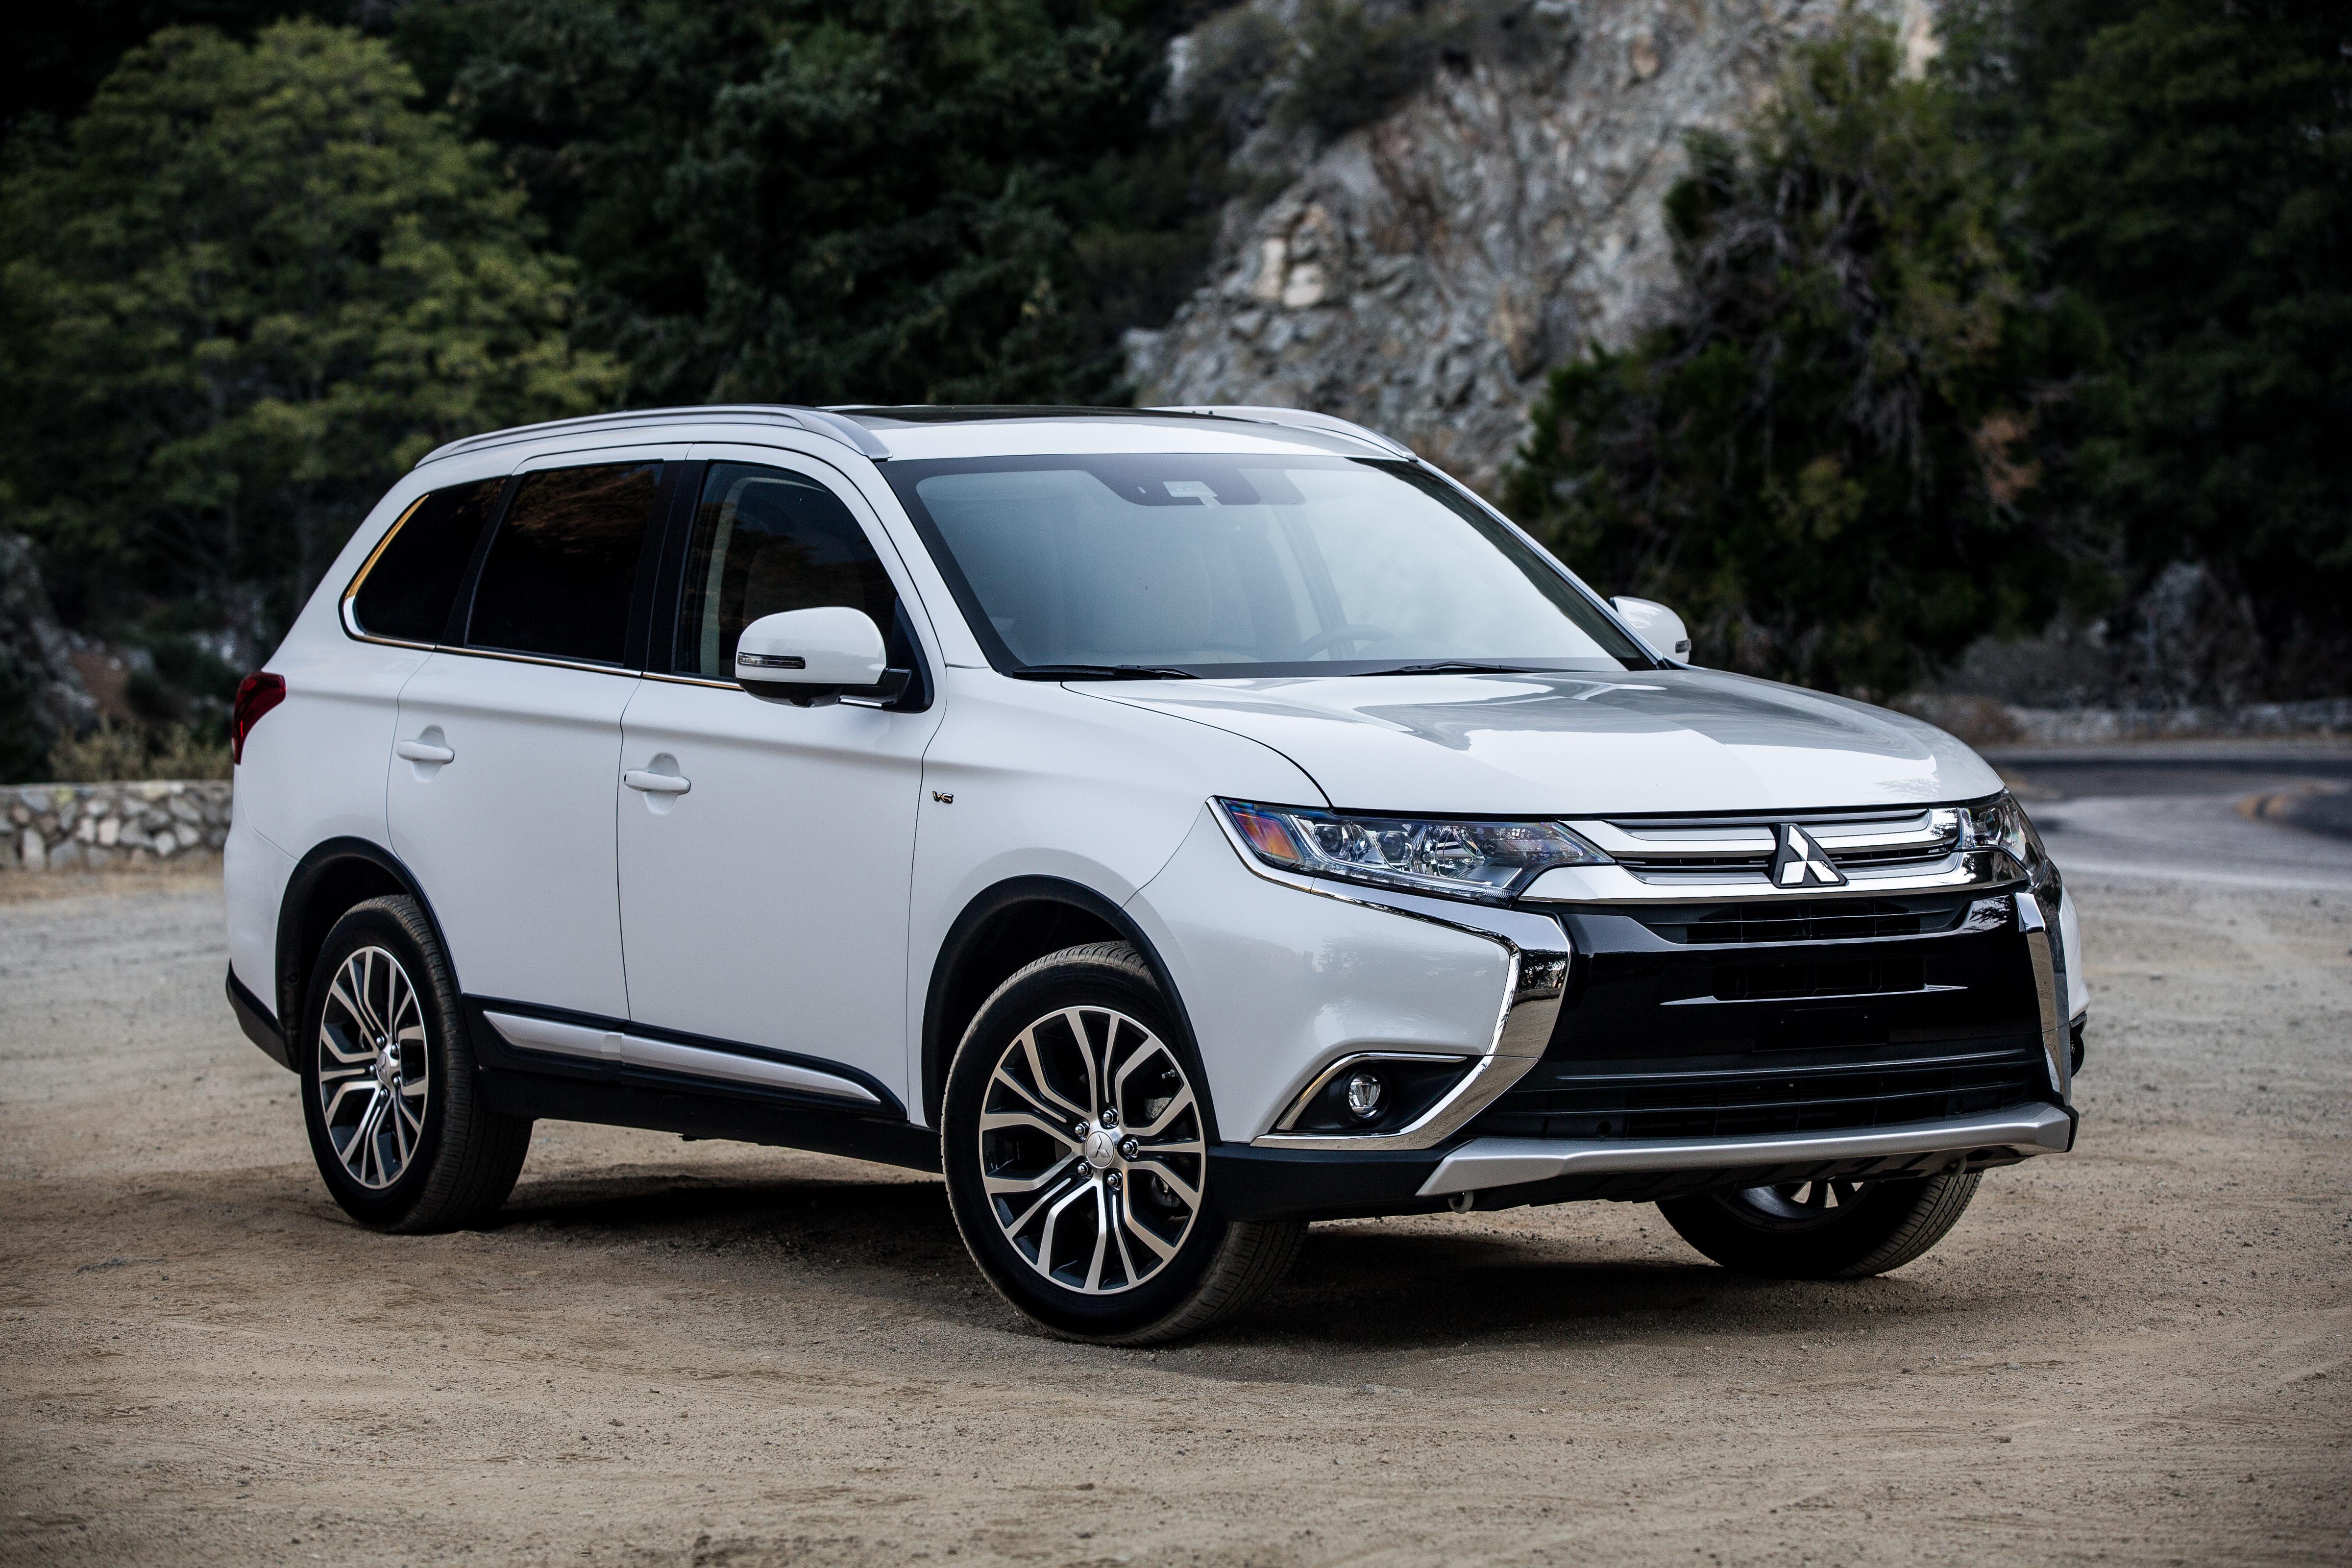 2018 Mitsubishi Outlander Named Insurance Insute for Highway ...